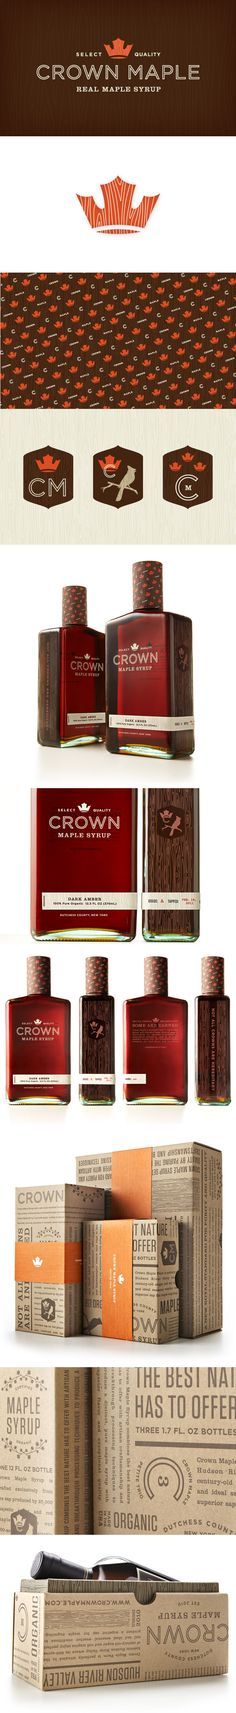 studio mpls | crown maple identity & packaging